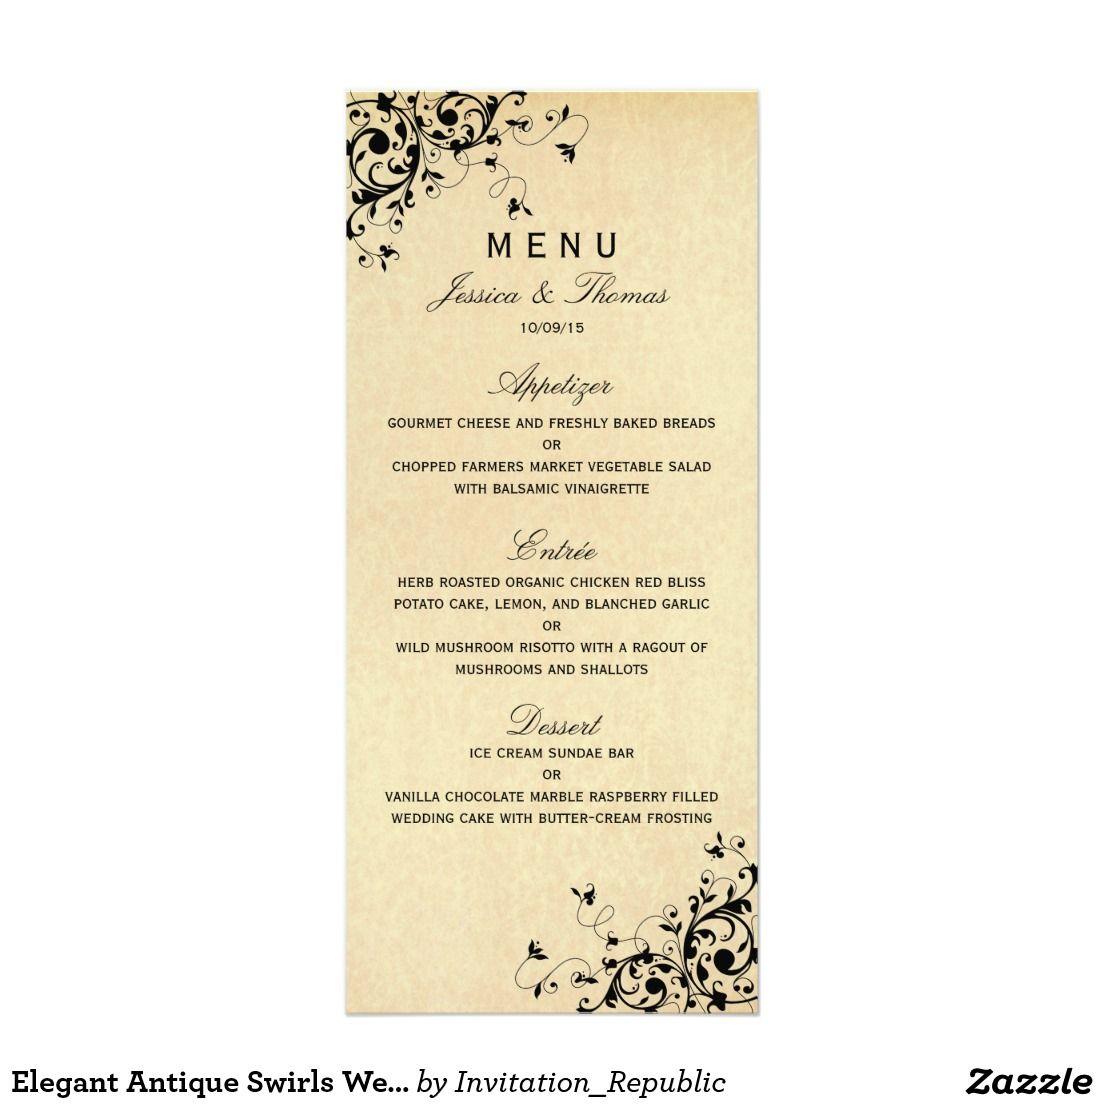 Elegant Antique Swirls Wedding Menu Rack Card Template | restaurant ...